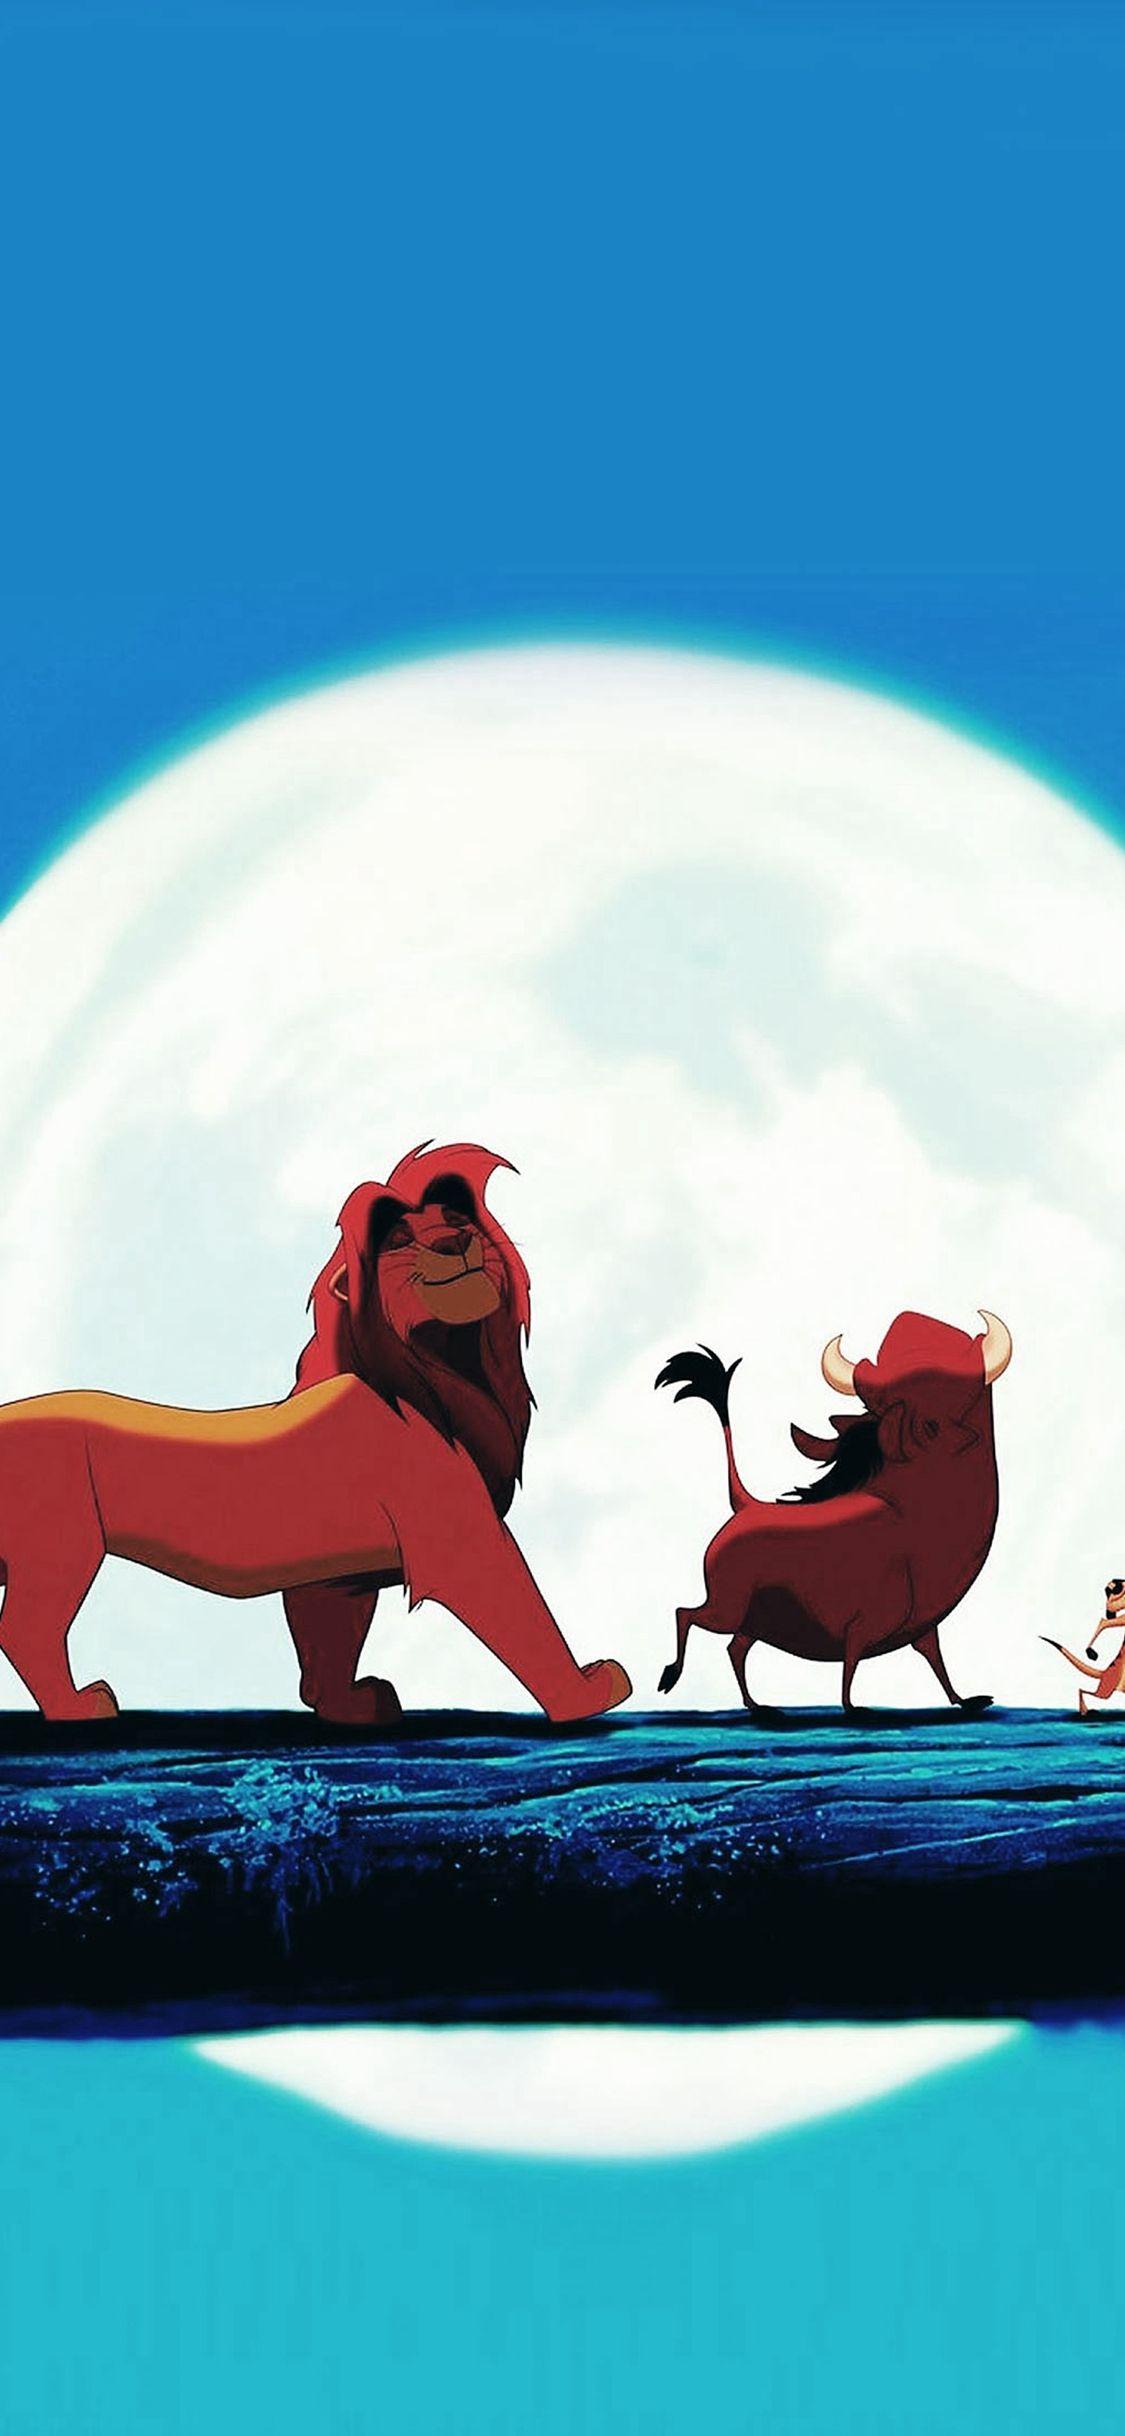 Hakuna Matata Disney Lionking Illust Art iPhone X wallpaper